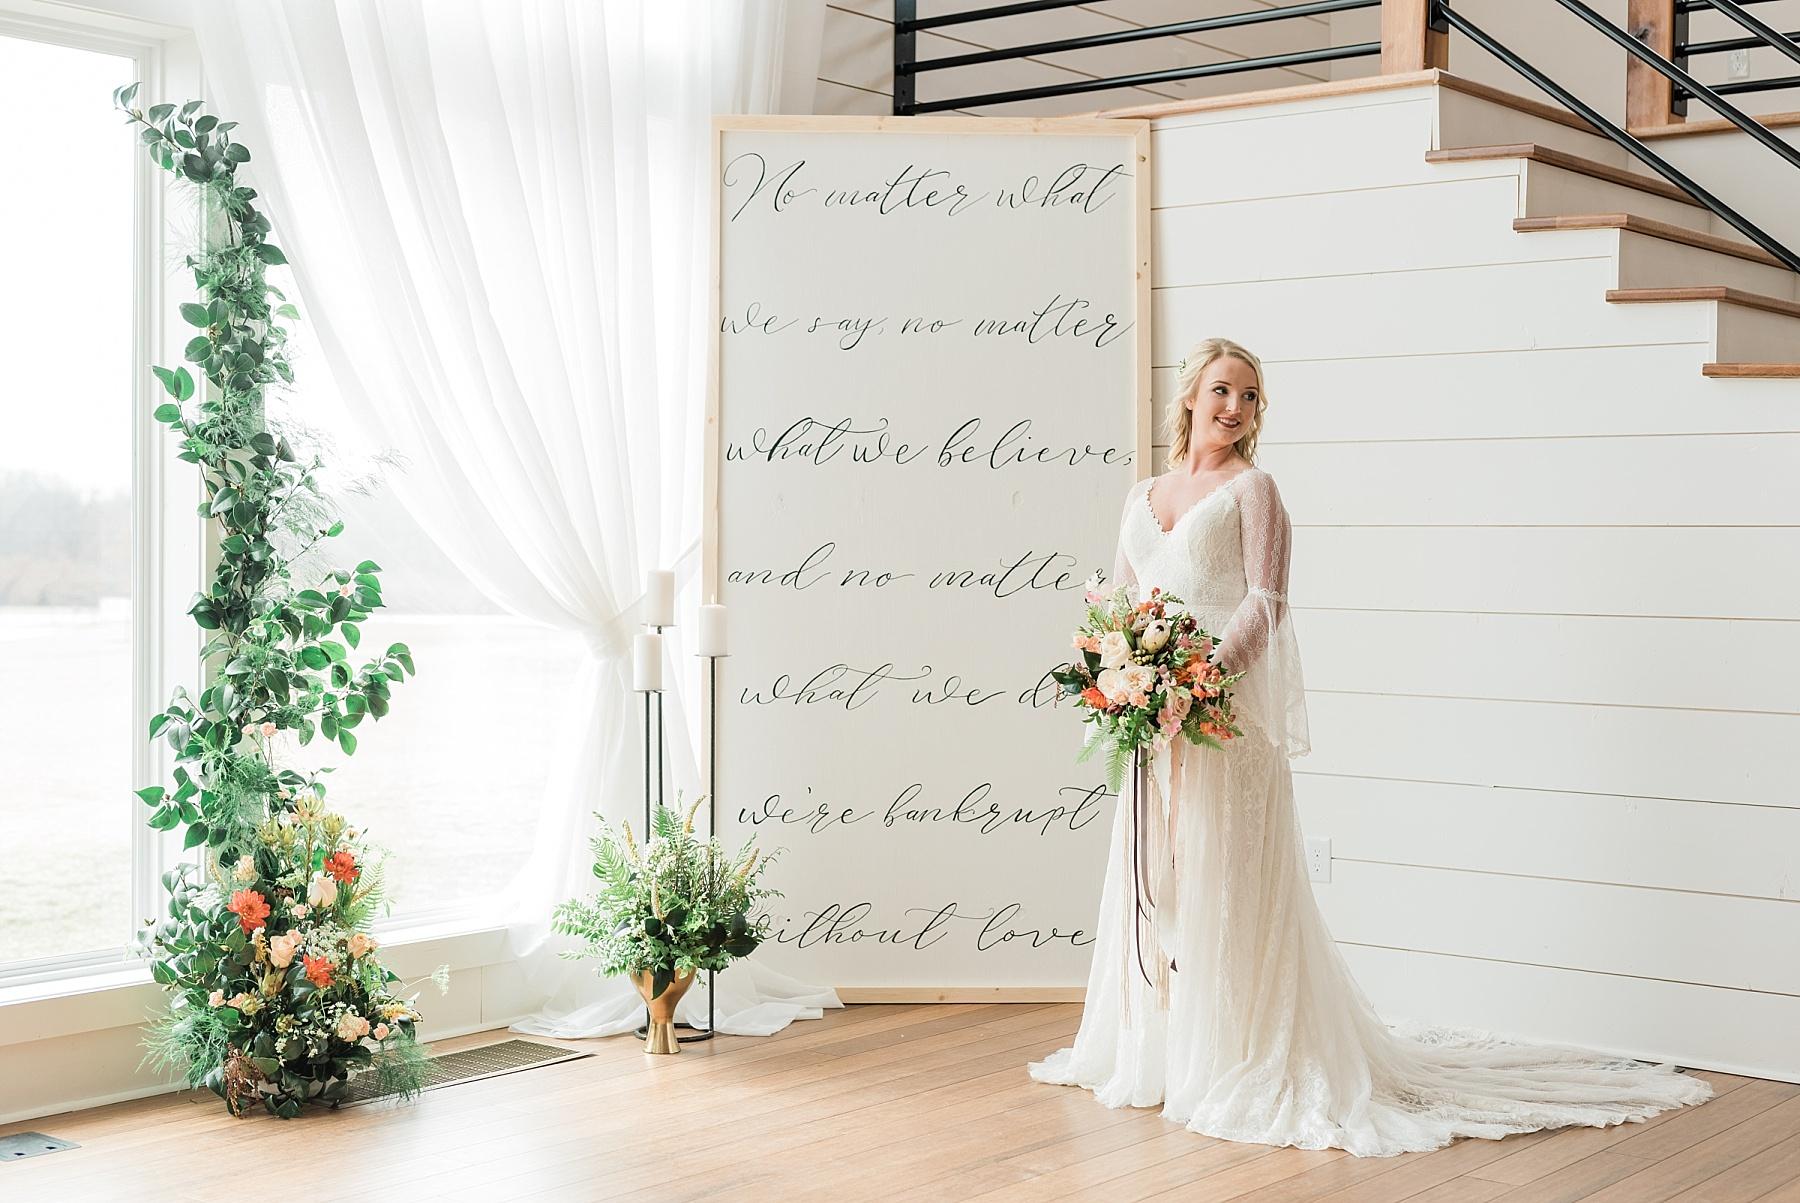 Eclectic Scandinavian Winter Wedding in All White Venue Emerson Fields by Kelsi Kliethermes Photography Best Missouri and Maui Wedding Photographer_0024.jpg